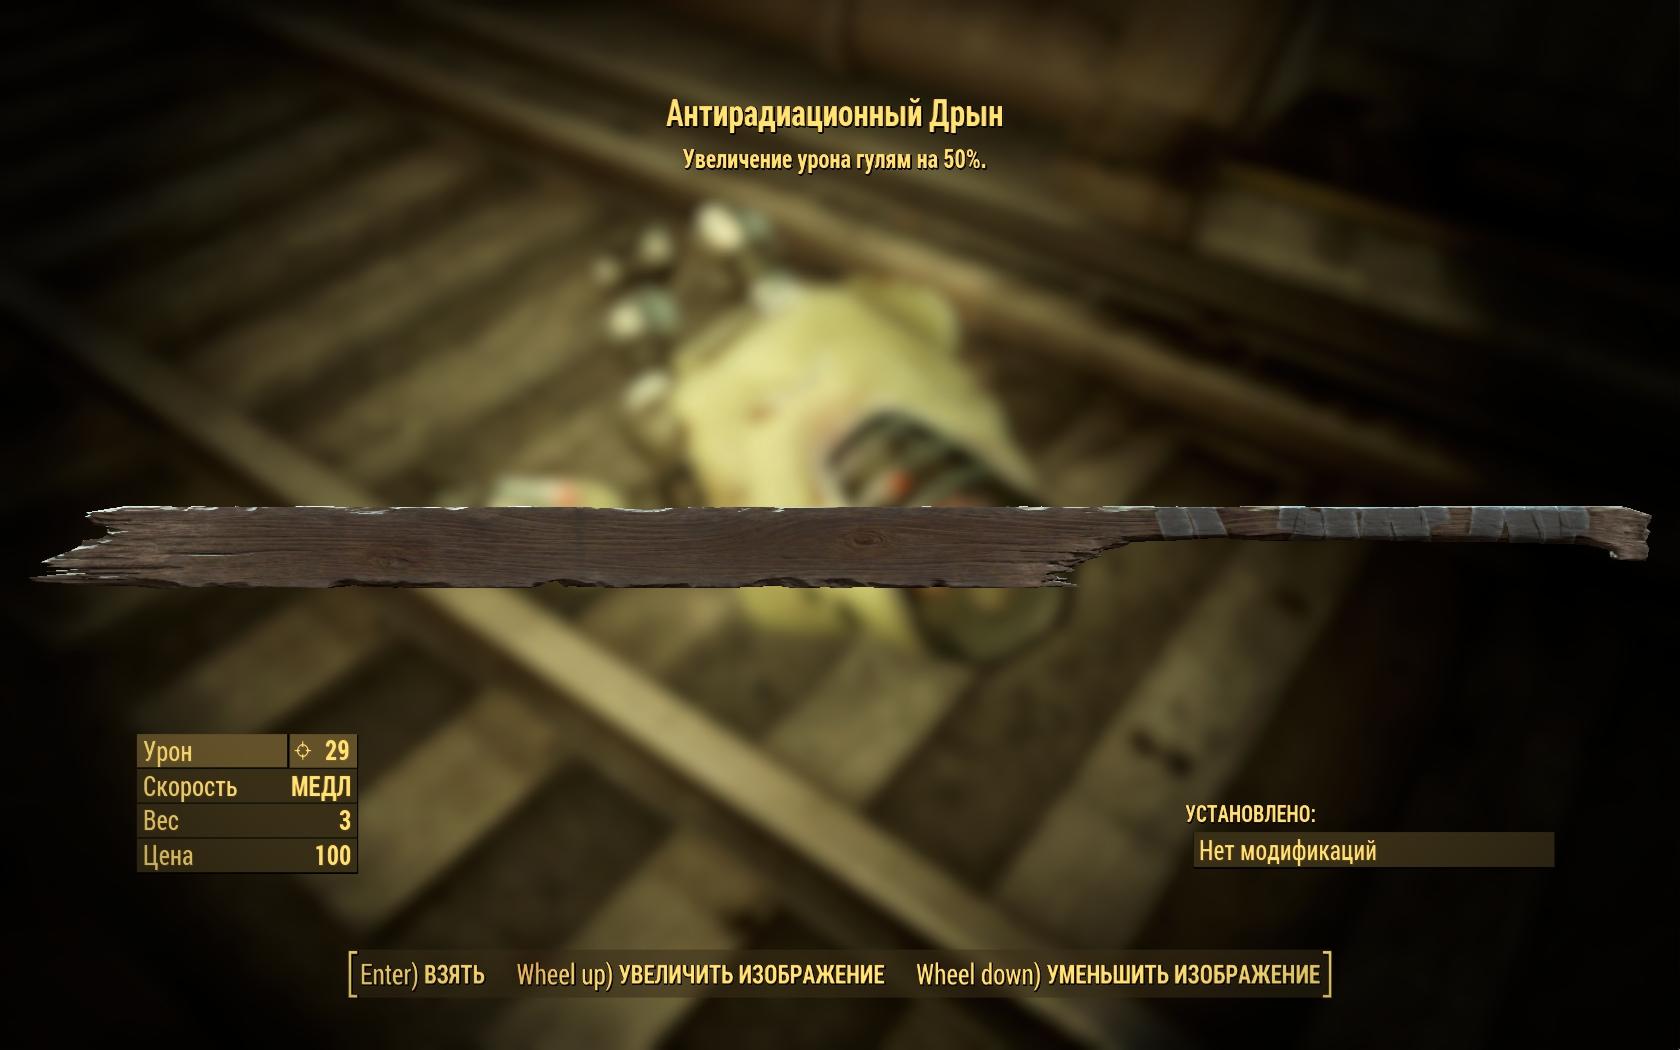 Антирадиационный дрын - Fallout 4 Оружие